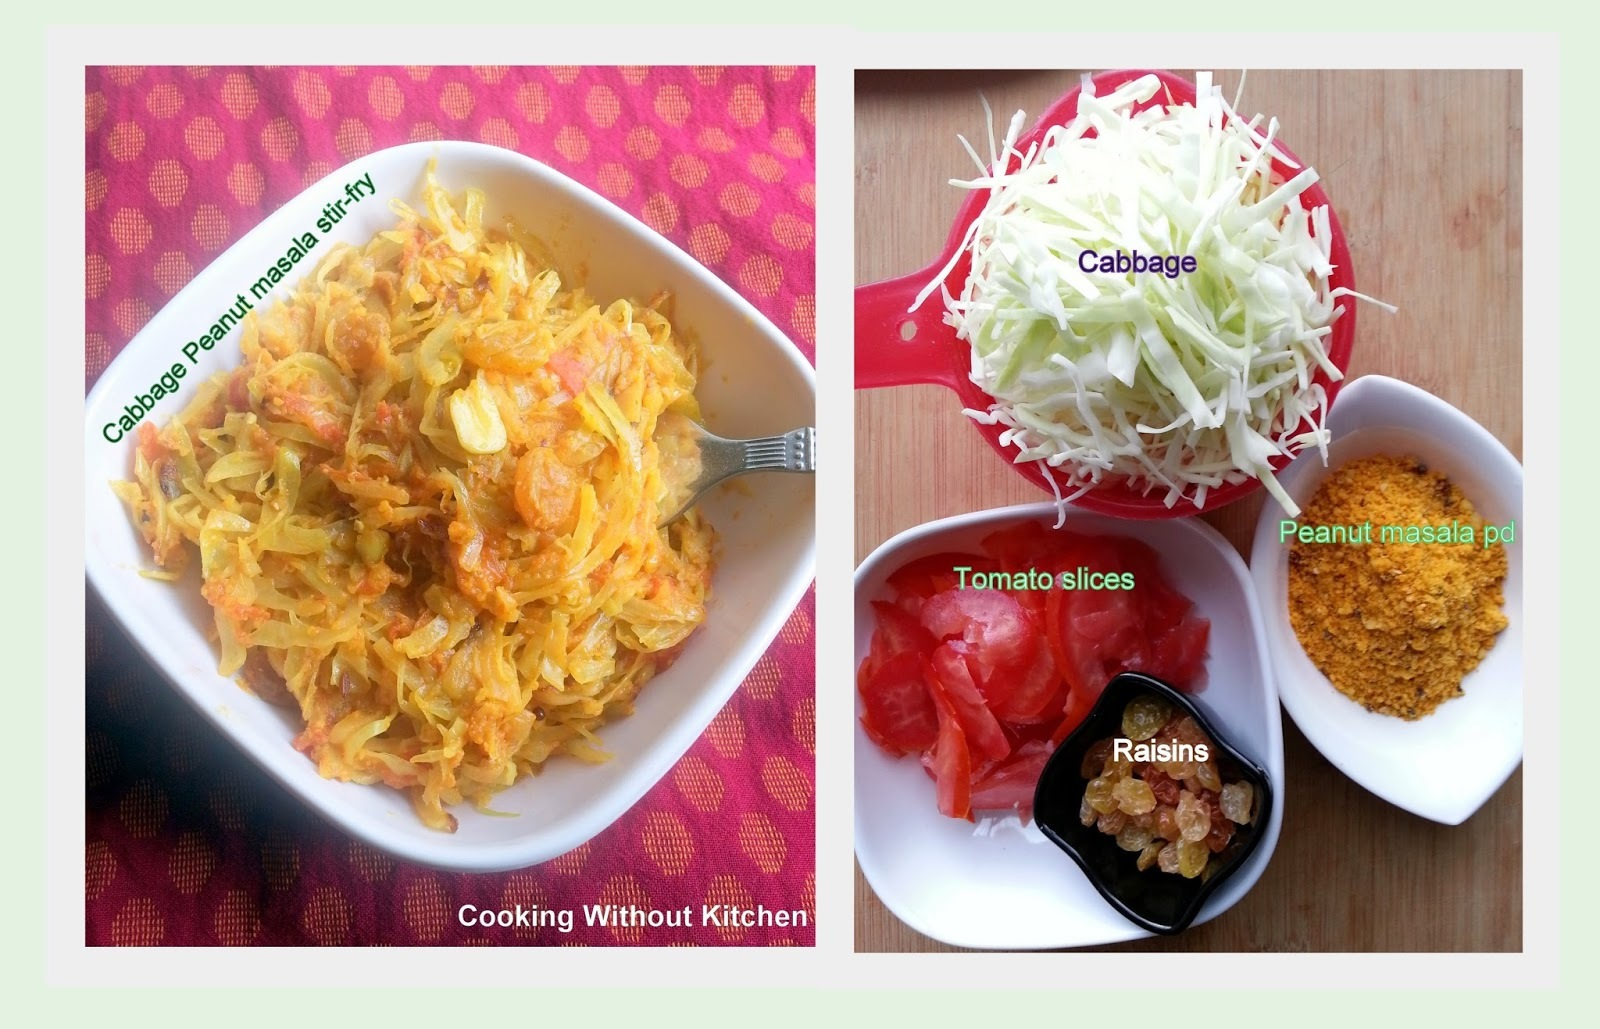 Cabbage peanut masala stirfry (Kobi nu shaak)